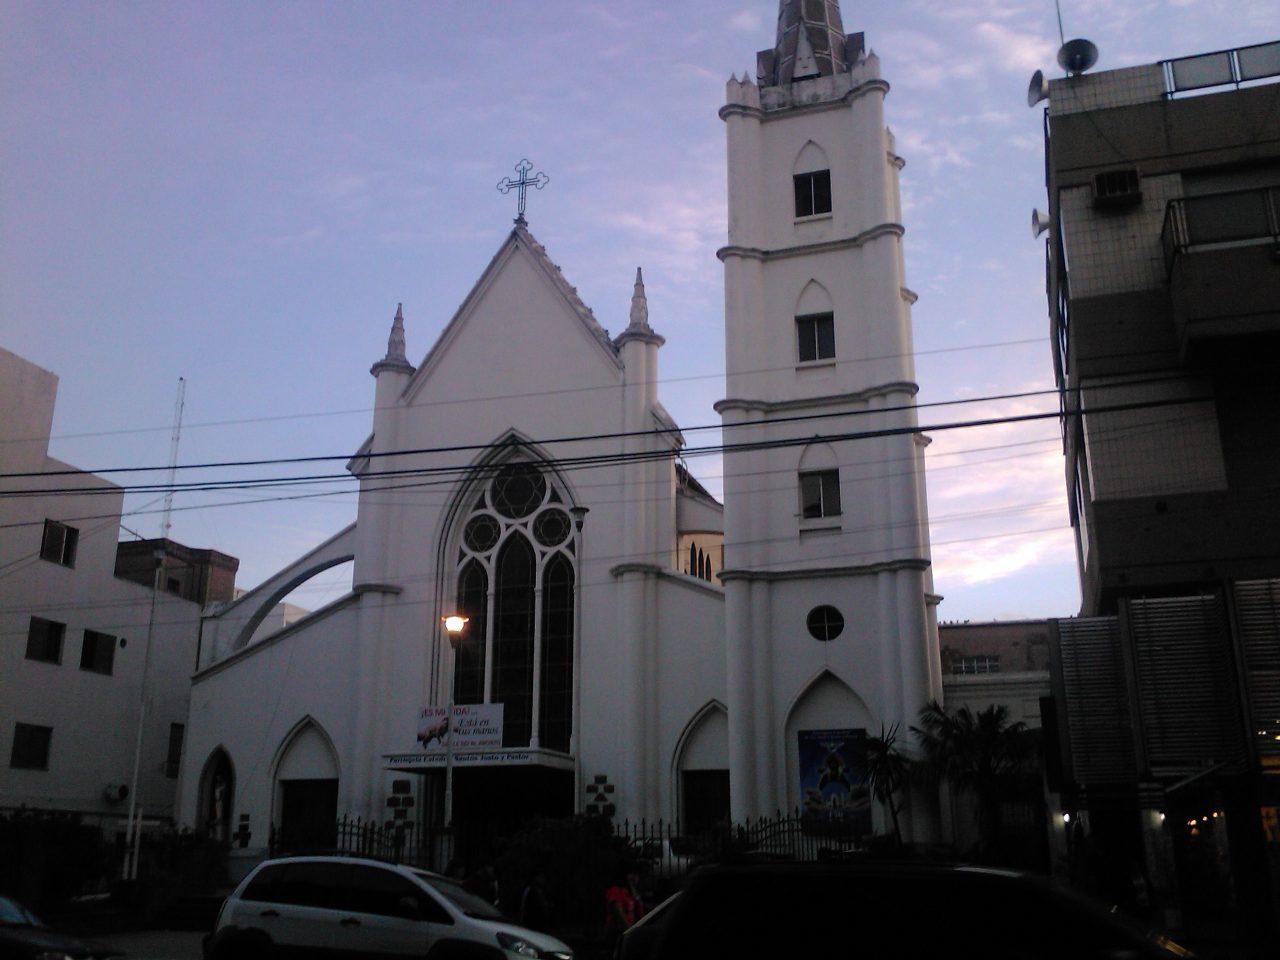 Catedral_de_San_Justo-1280x960.jpg